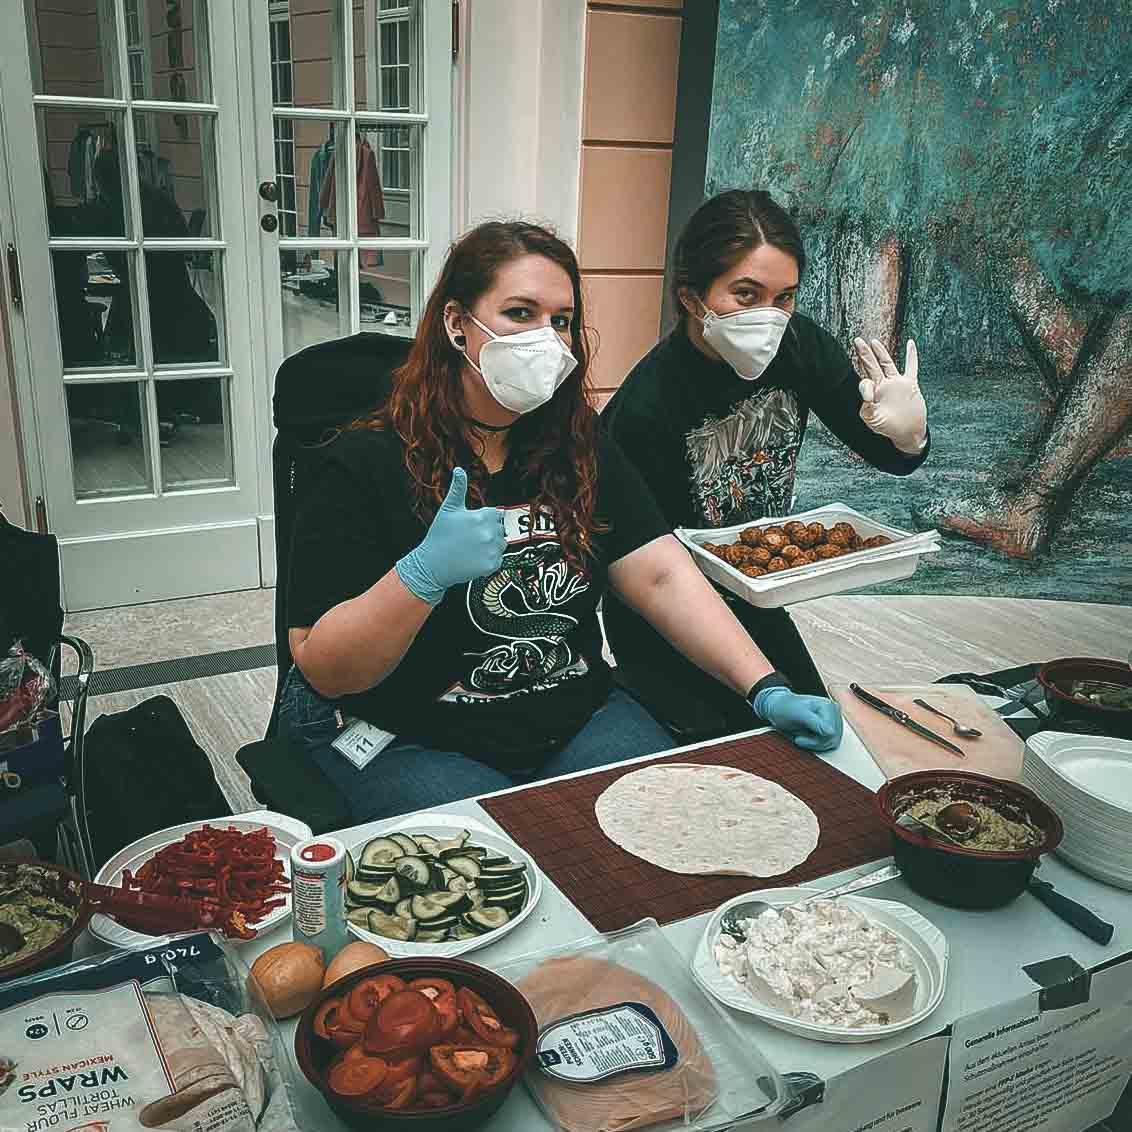 Lisa Pac - Boring BTS Pics Komprimiert (8 von 19)